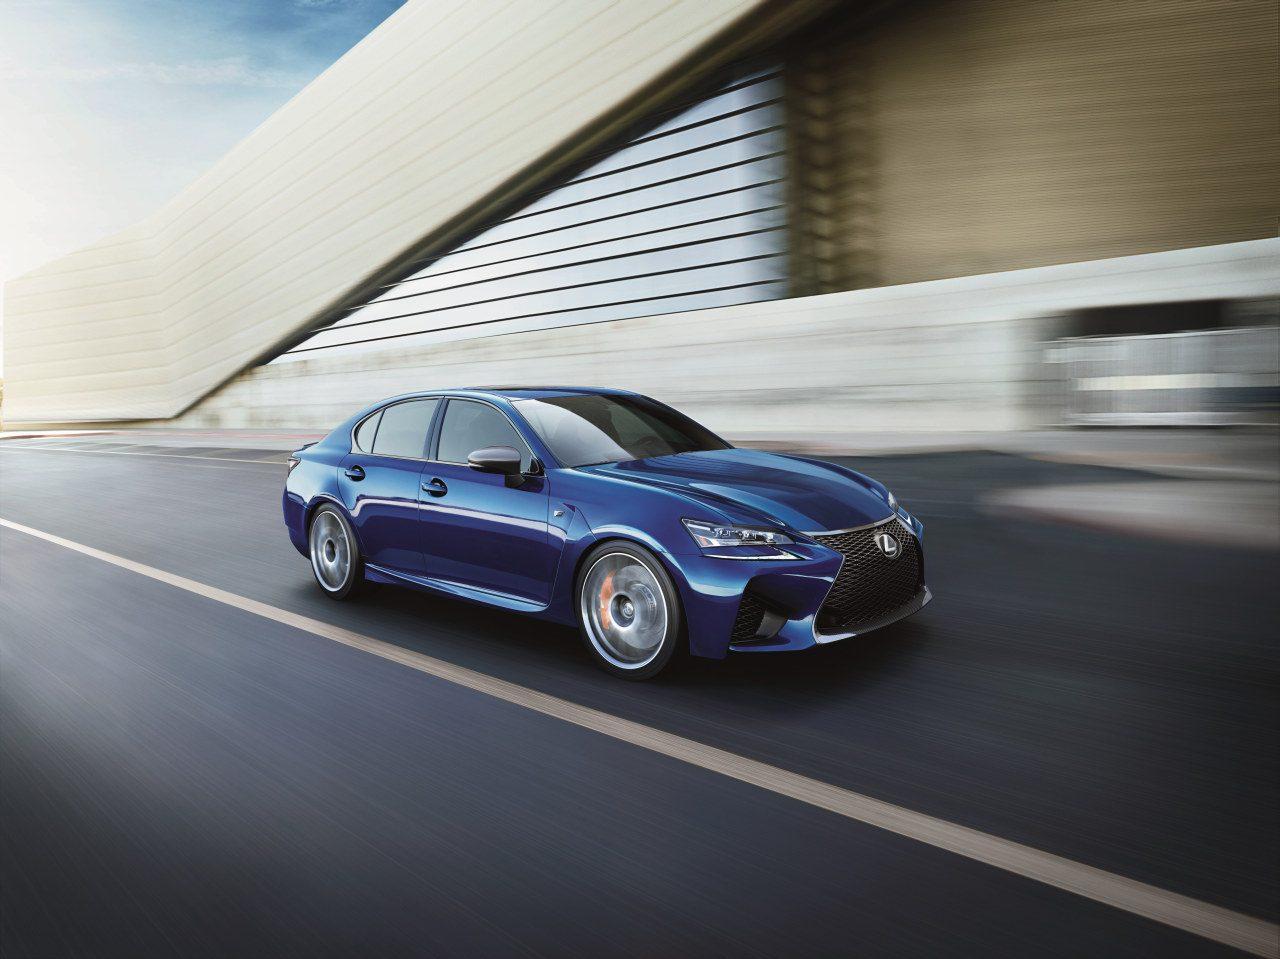 Lexus_GS-F-05.jpg